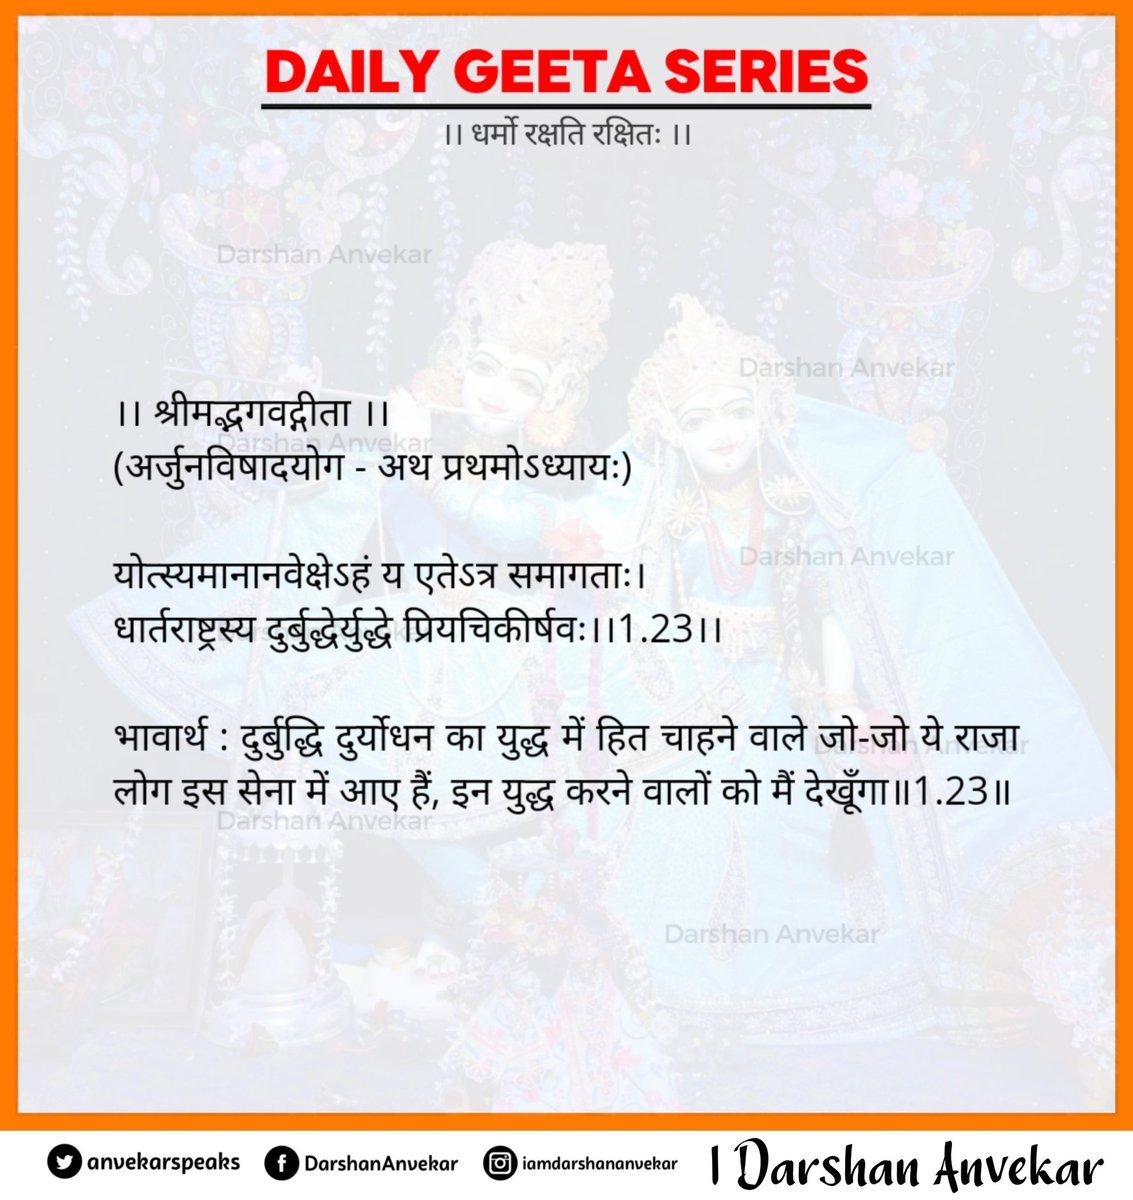 #DailyGeeta #Day21